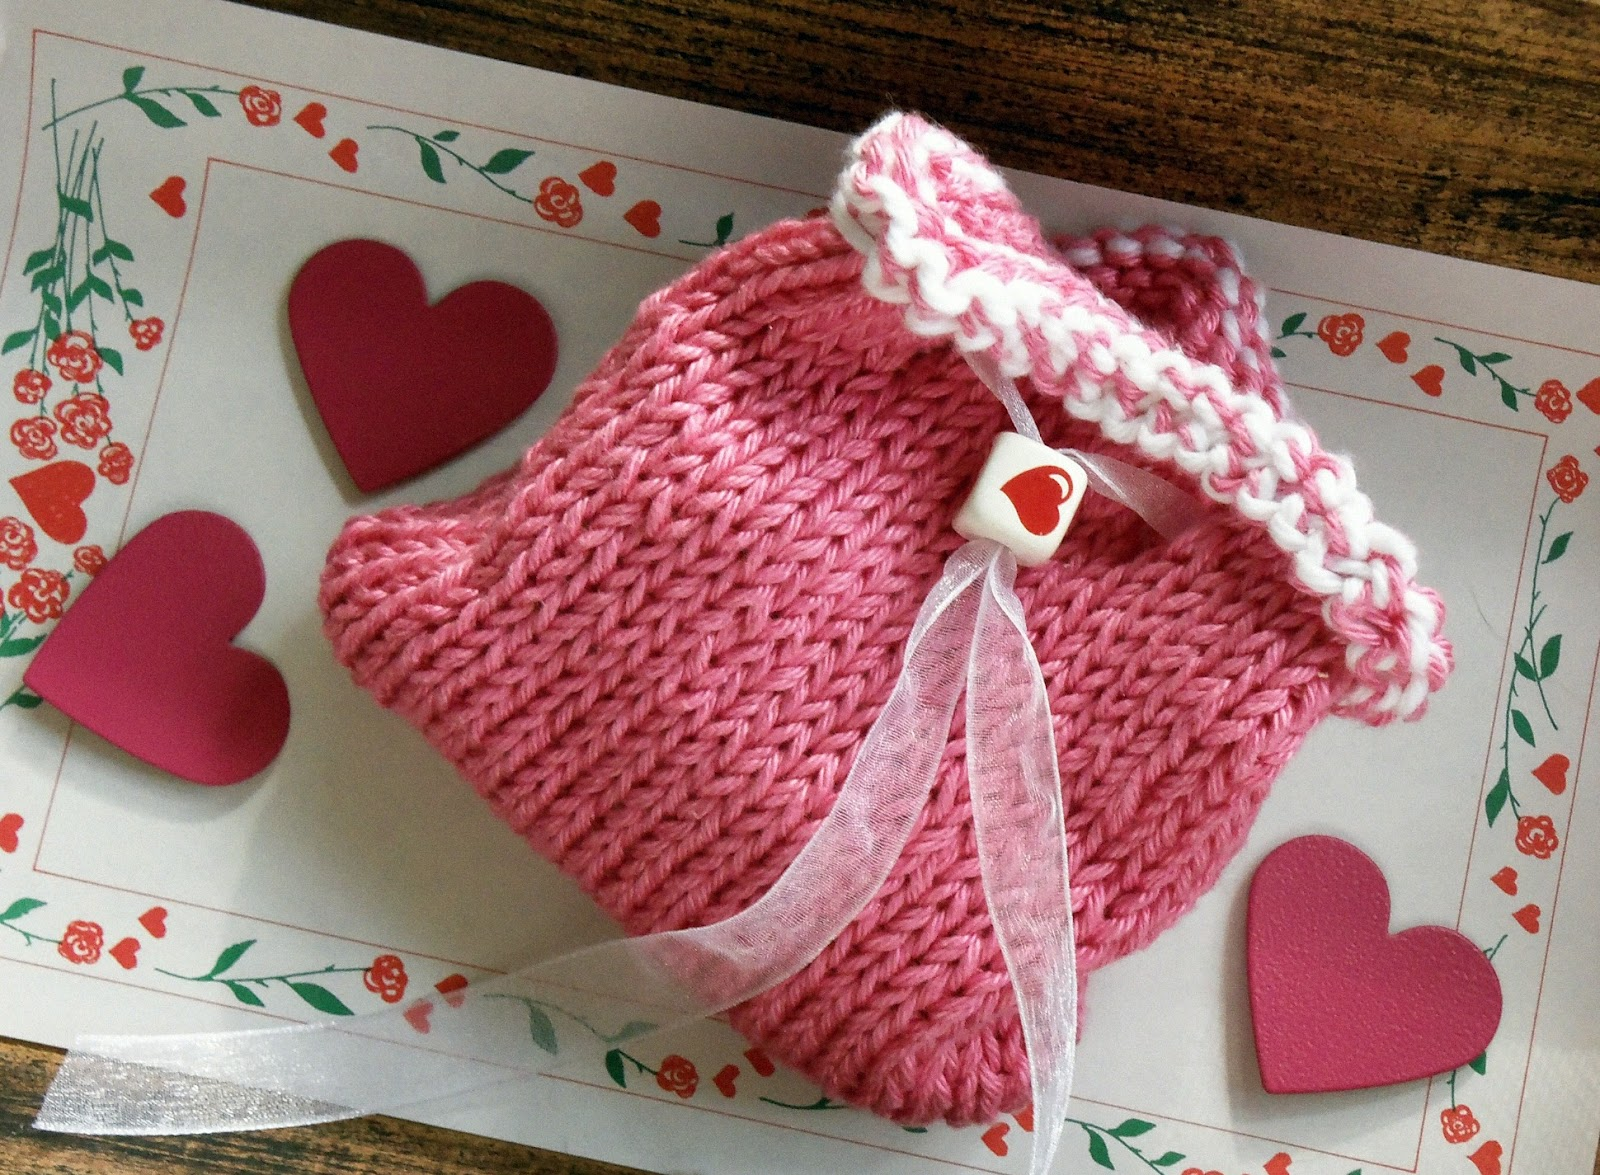 golden bird knits: The return of the mini-drawstring bag